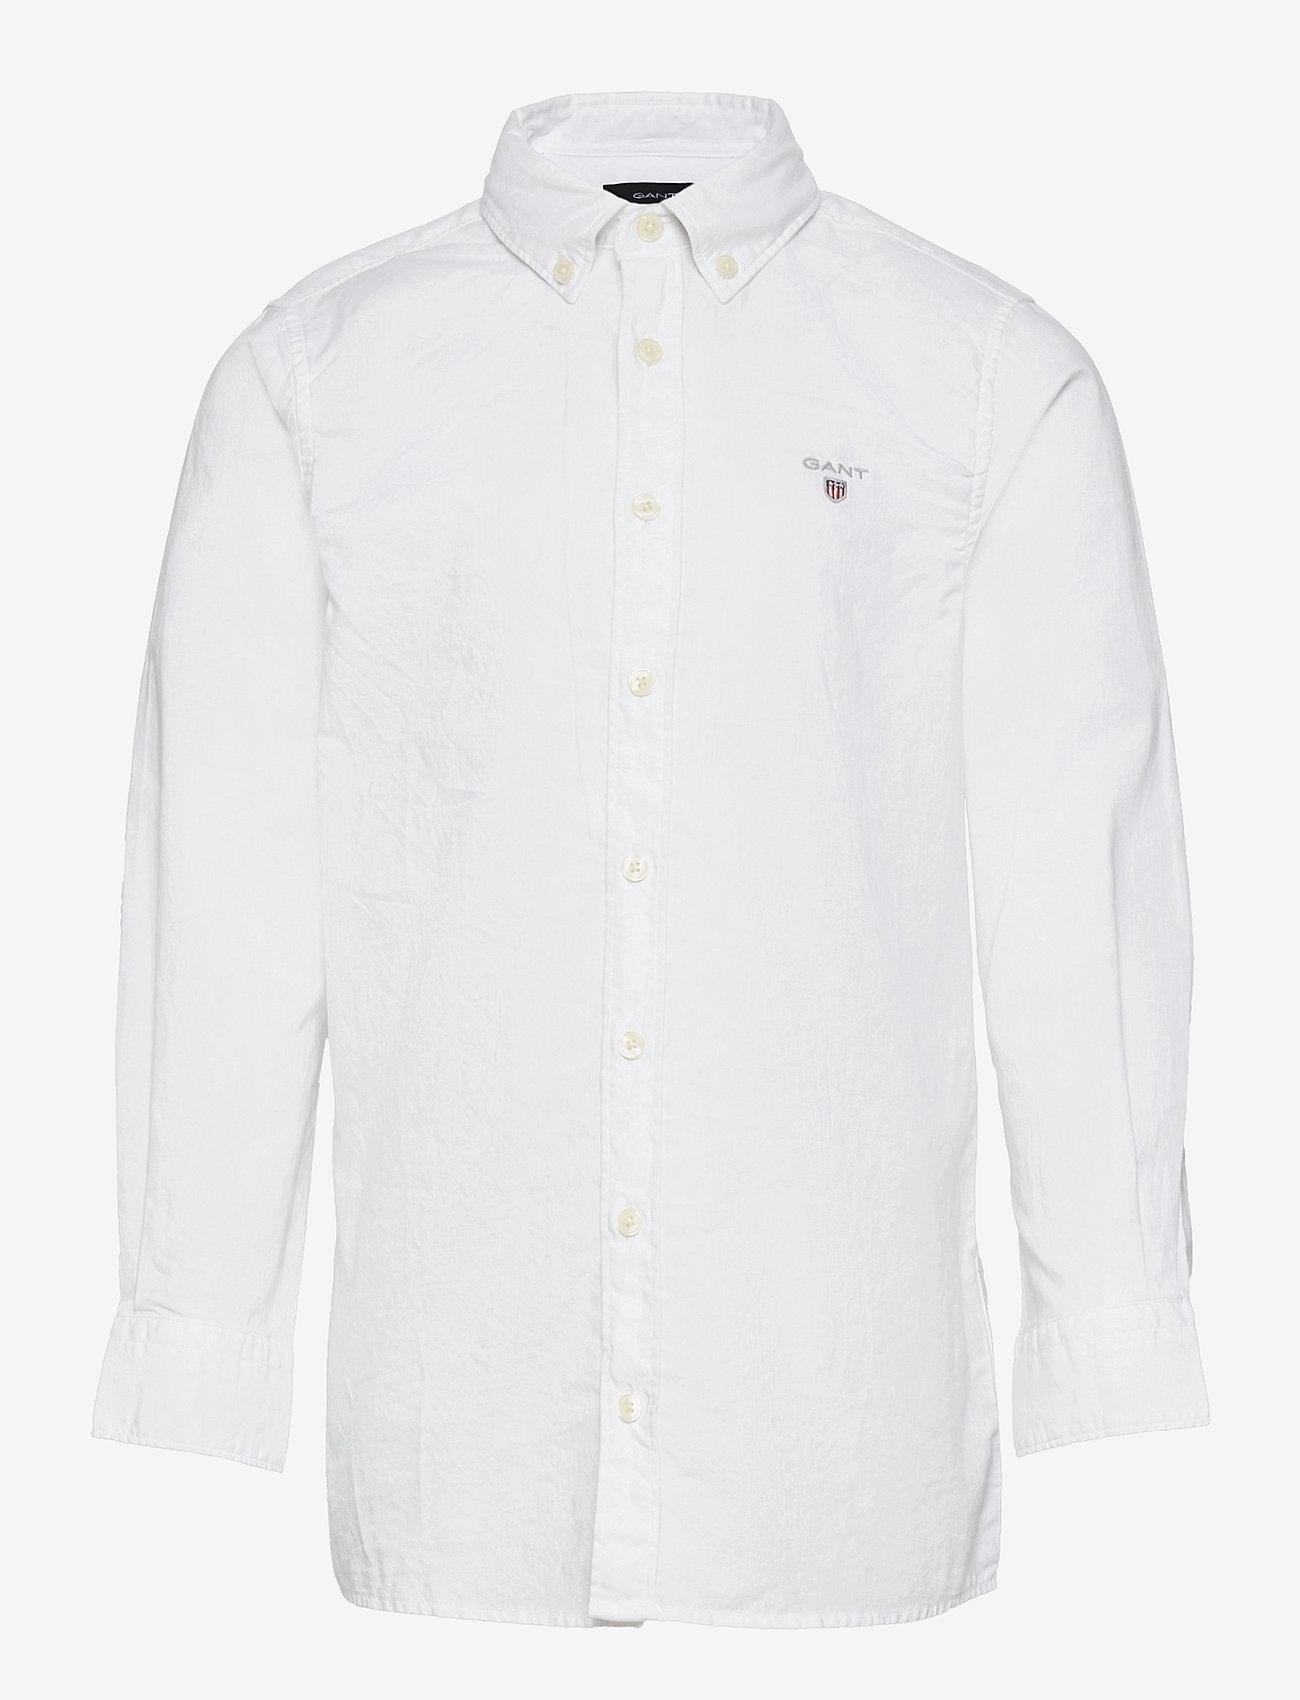 GANT - THE ORIGINAL TWILL SHIRT - overhemden - white - 0